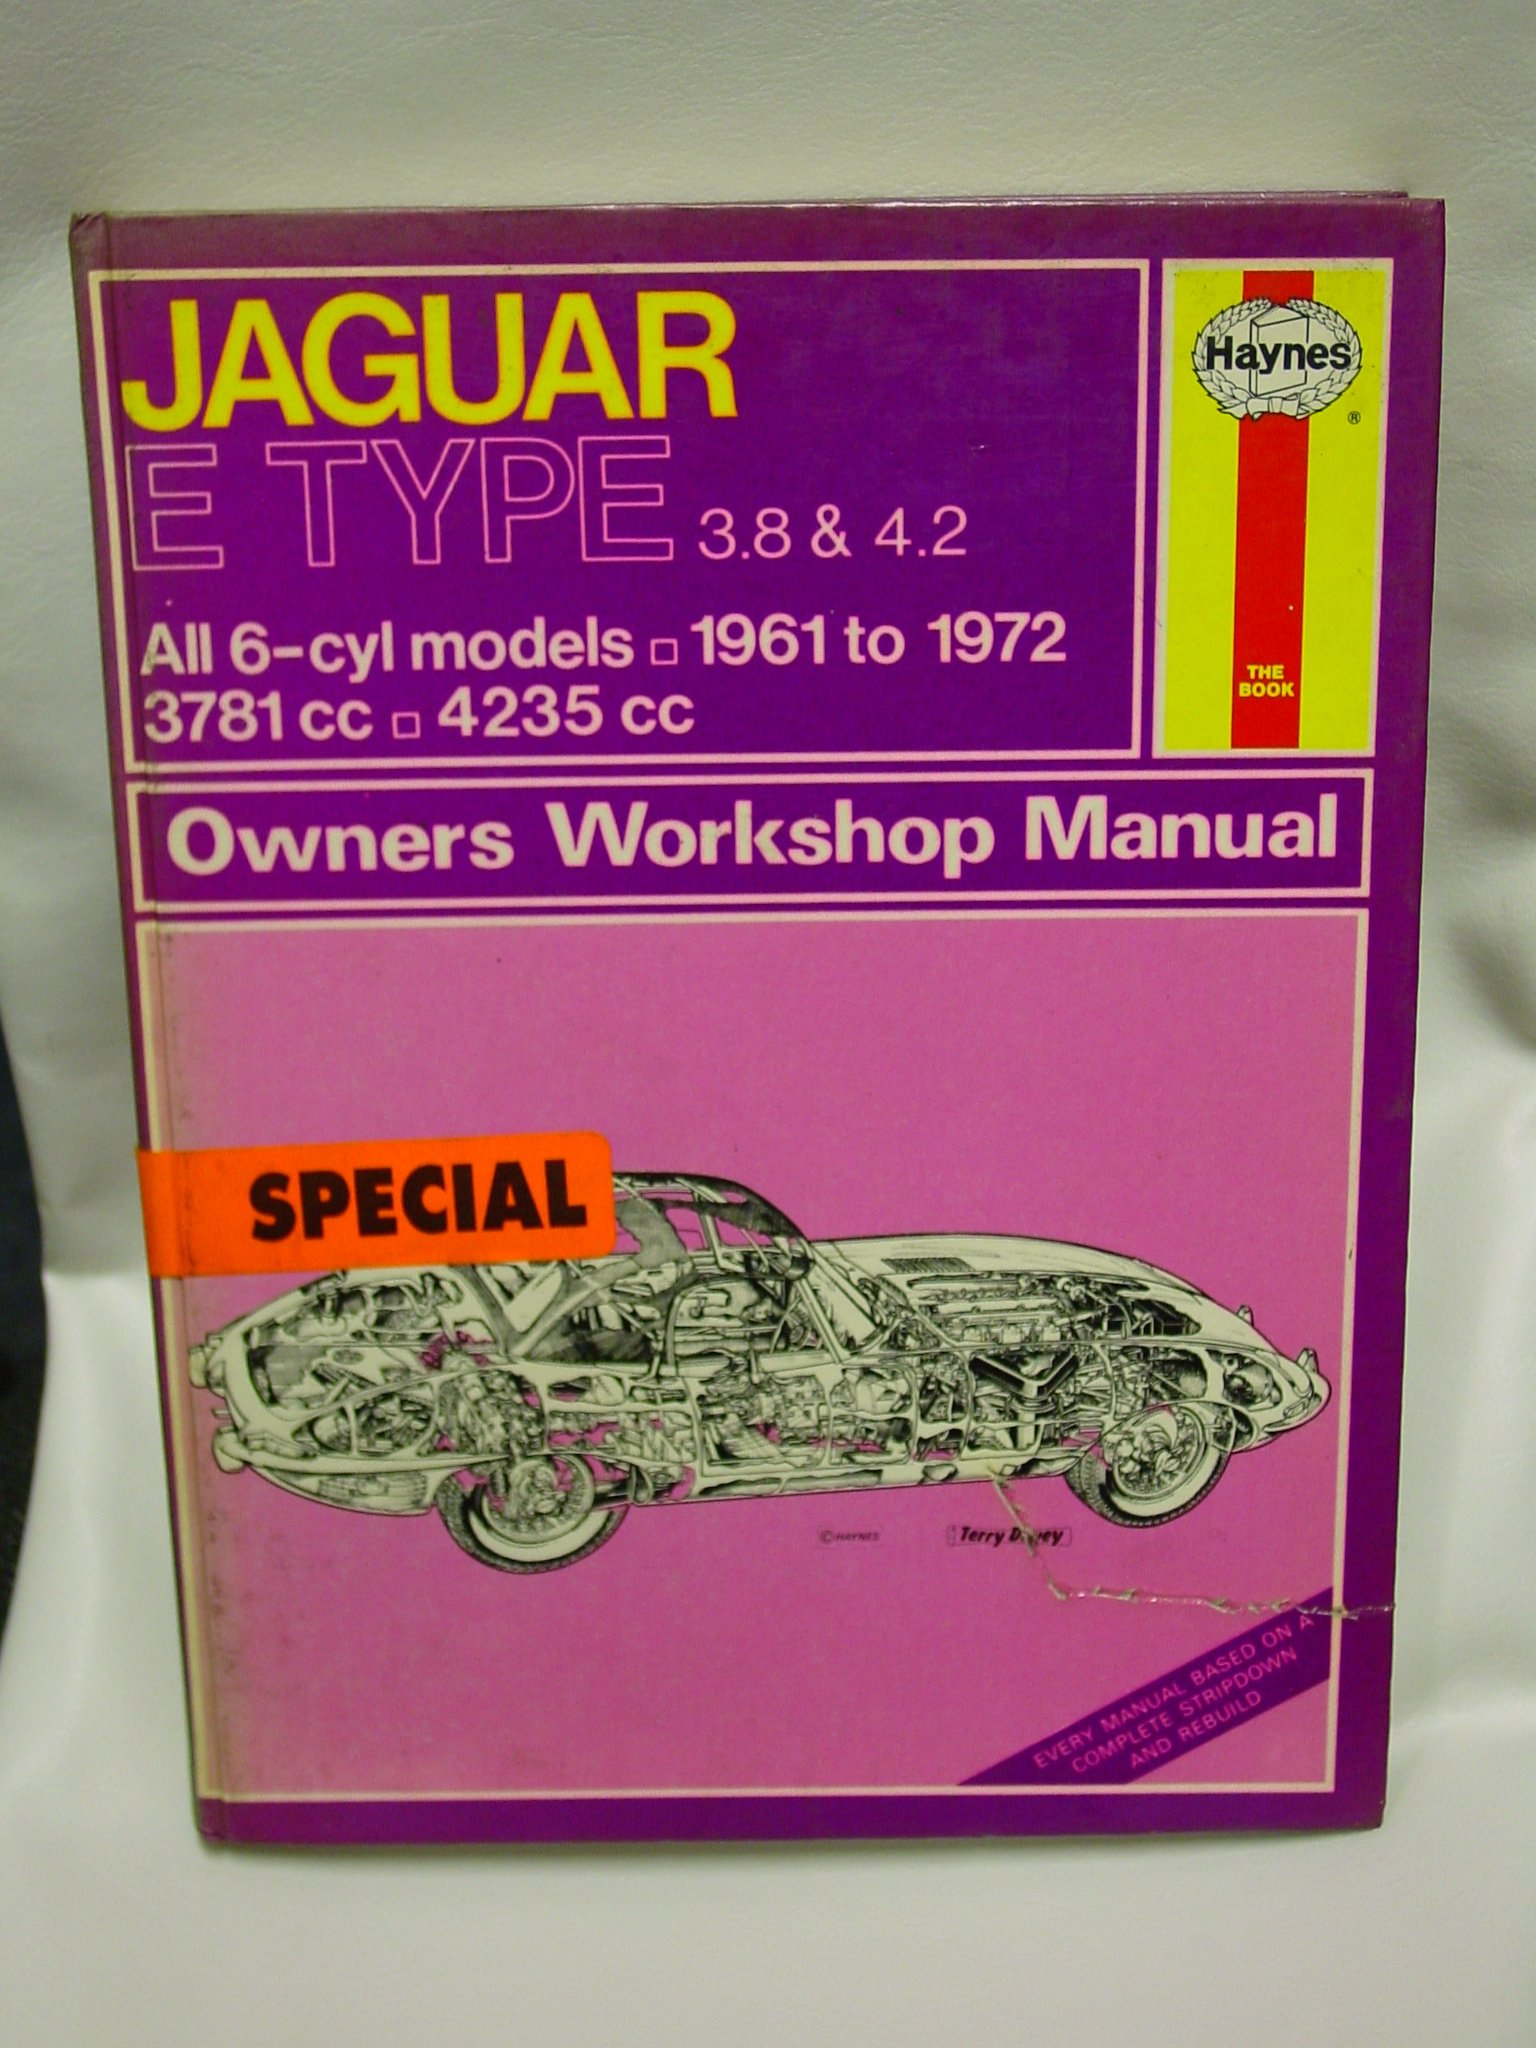 Jaguar etype service manual ebook array haynes jaguar e type 3 8 u0026 4 2 owners workshop manual no 140 fandeluxe Images